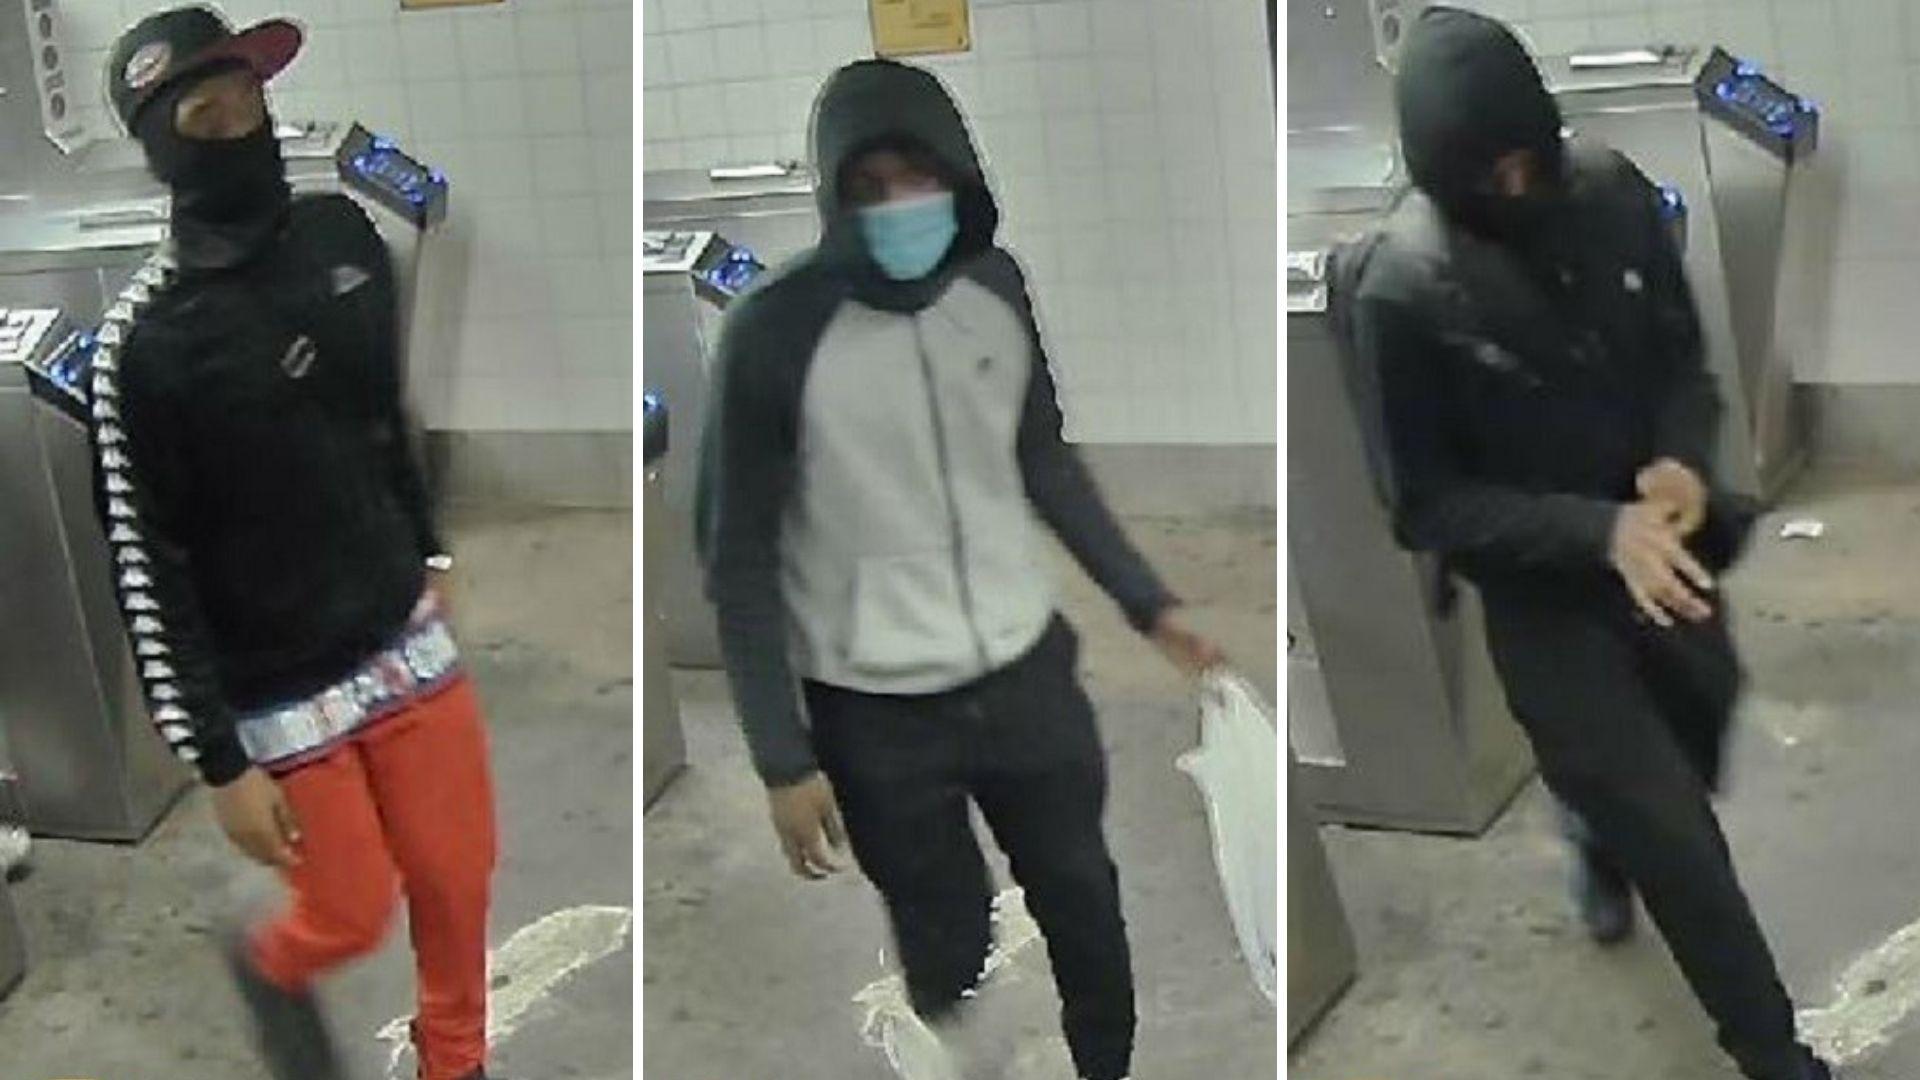 Trio put man in chokehold, rob him at gunpoint in Bronx subway station